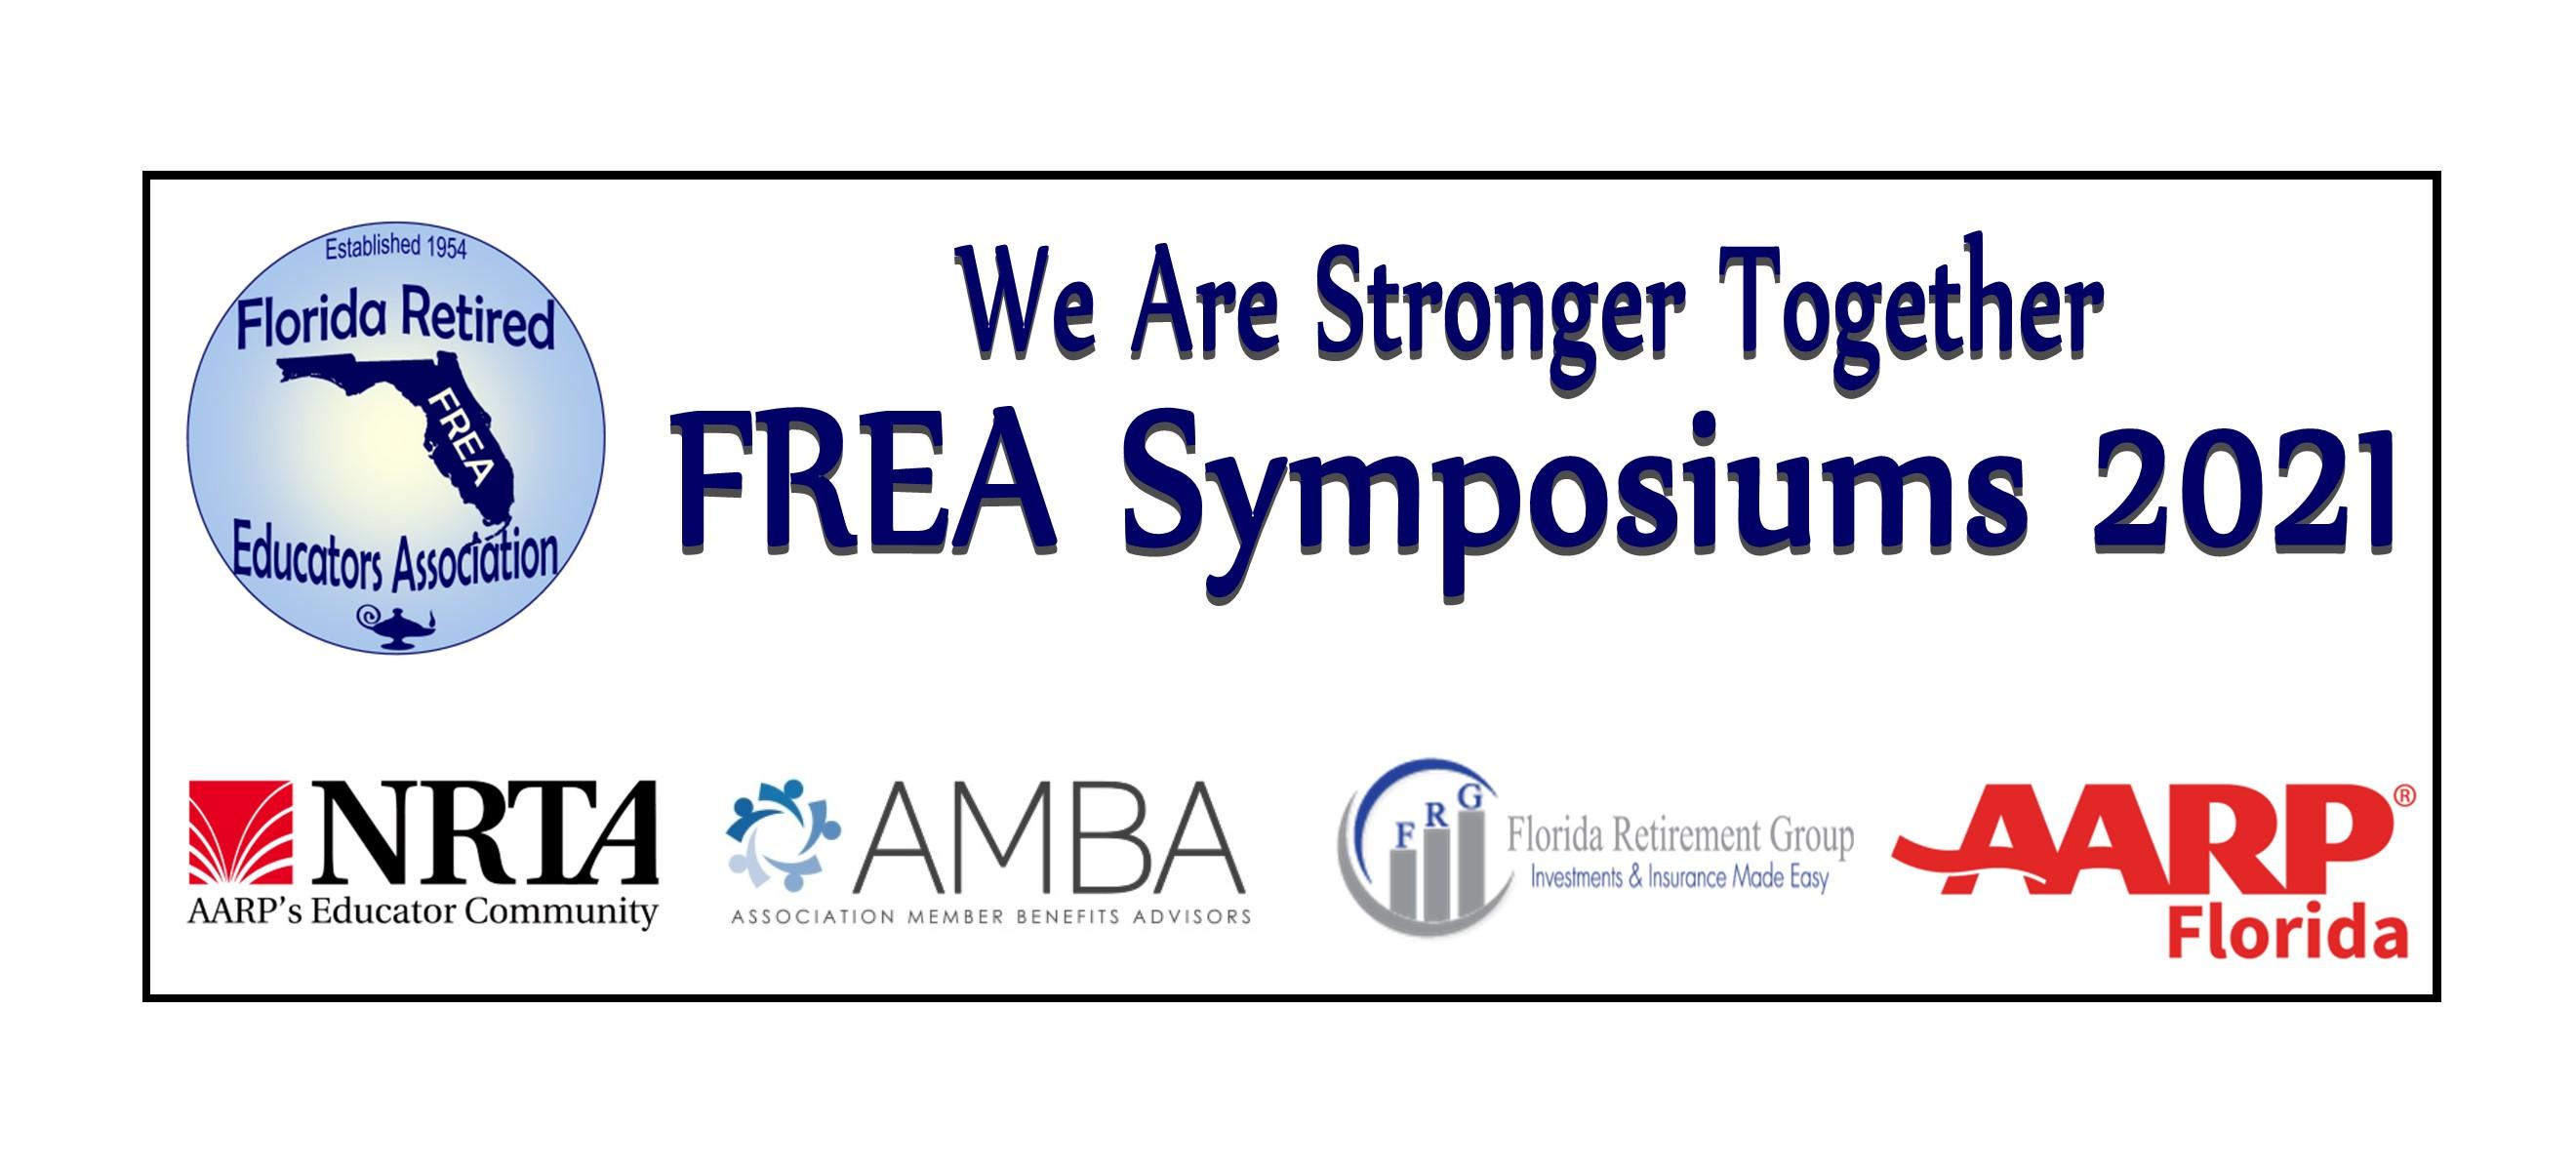 Symposium 2021 logo with partners new AARP